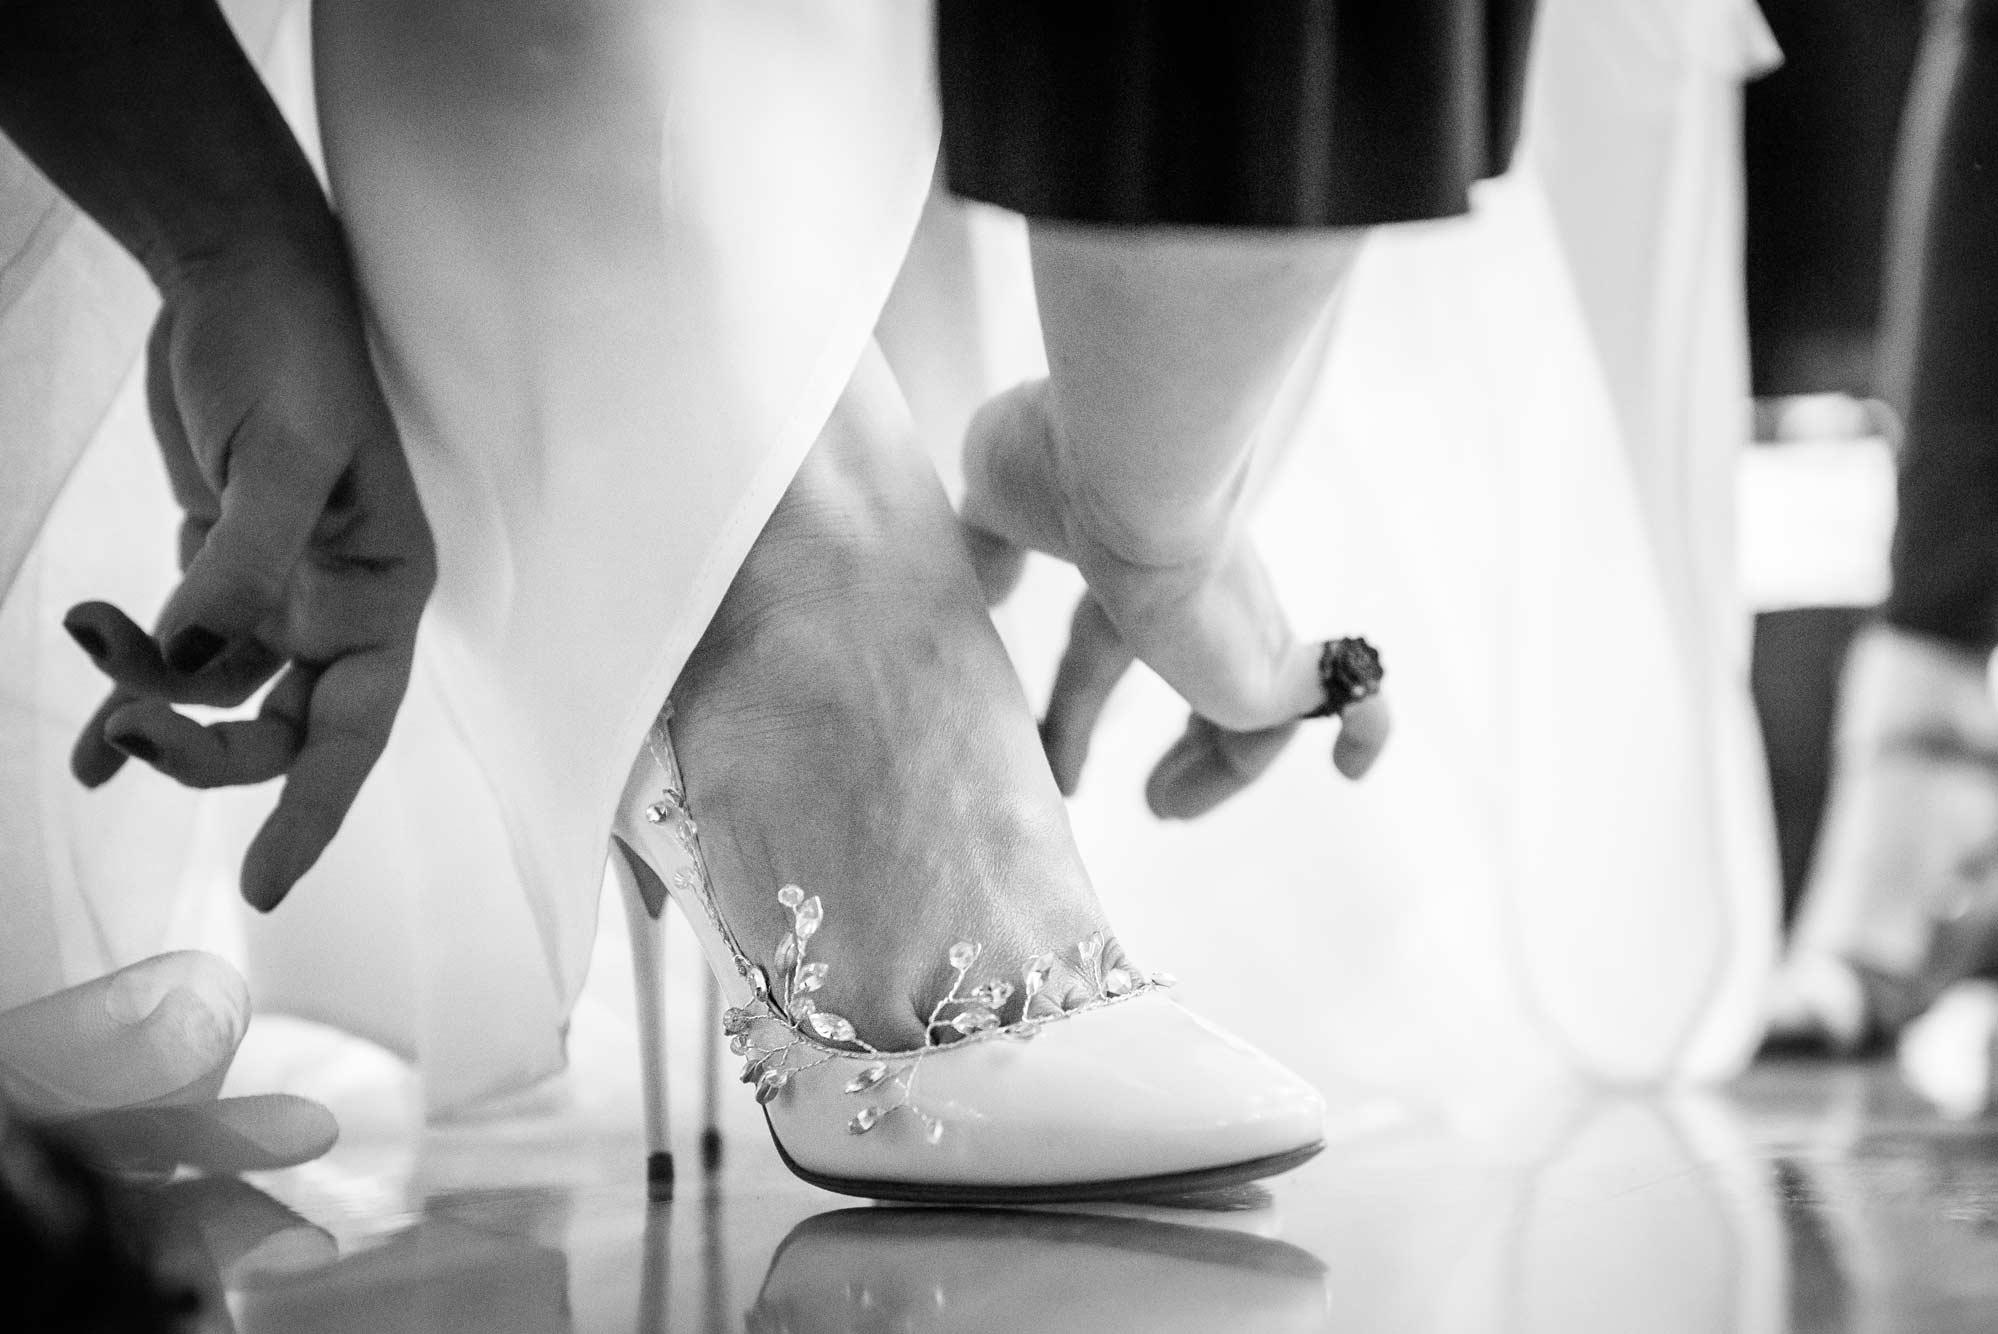 Fotografo-Stile-Reportage-Matrimonio-Roma-Preparativi-Sposa